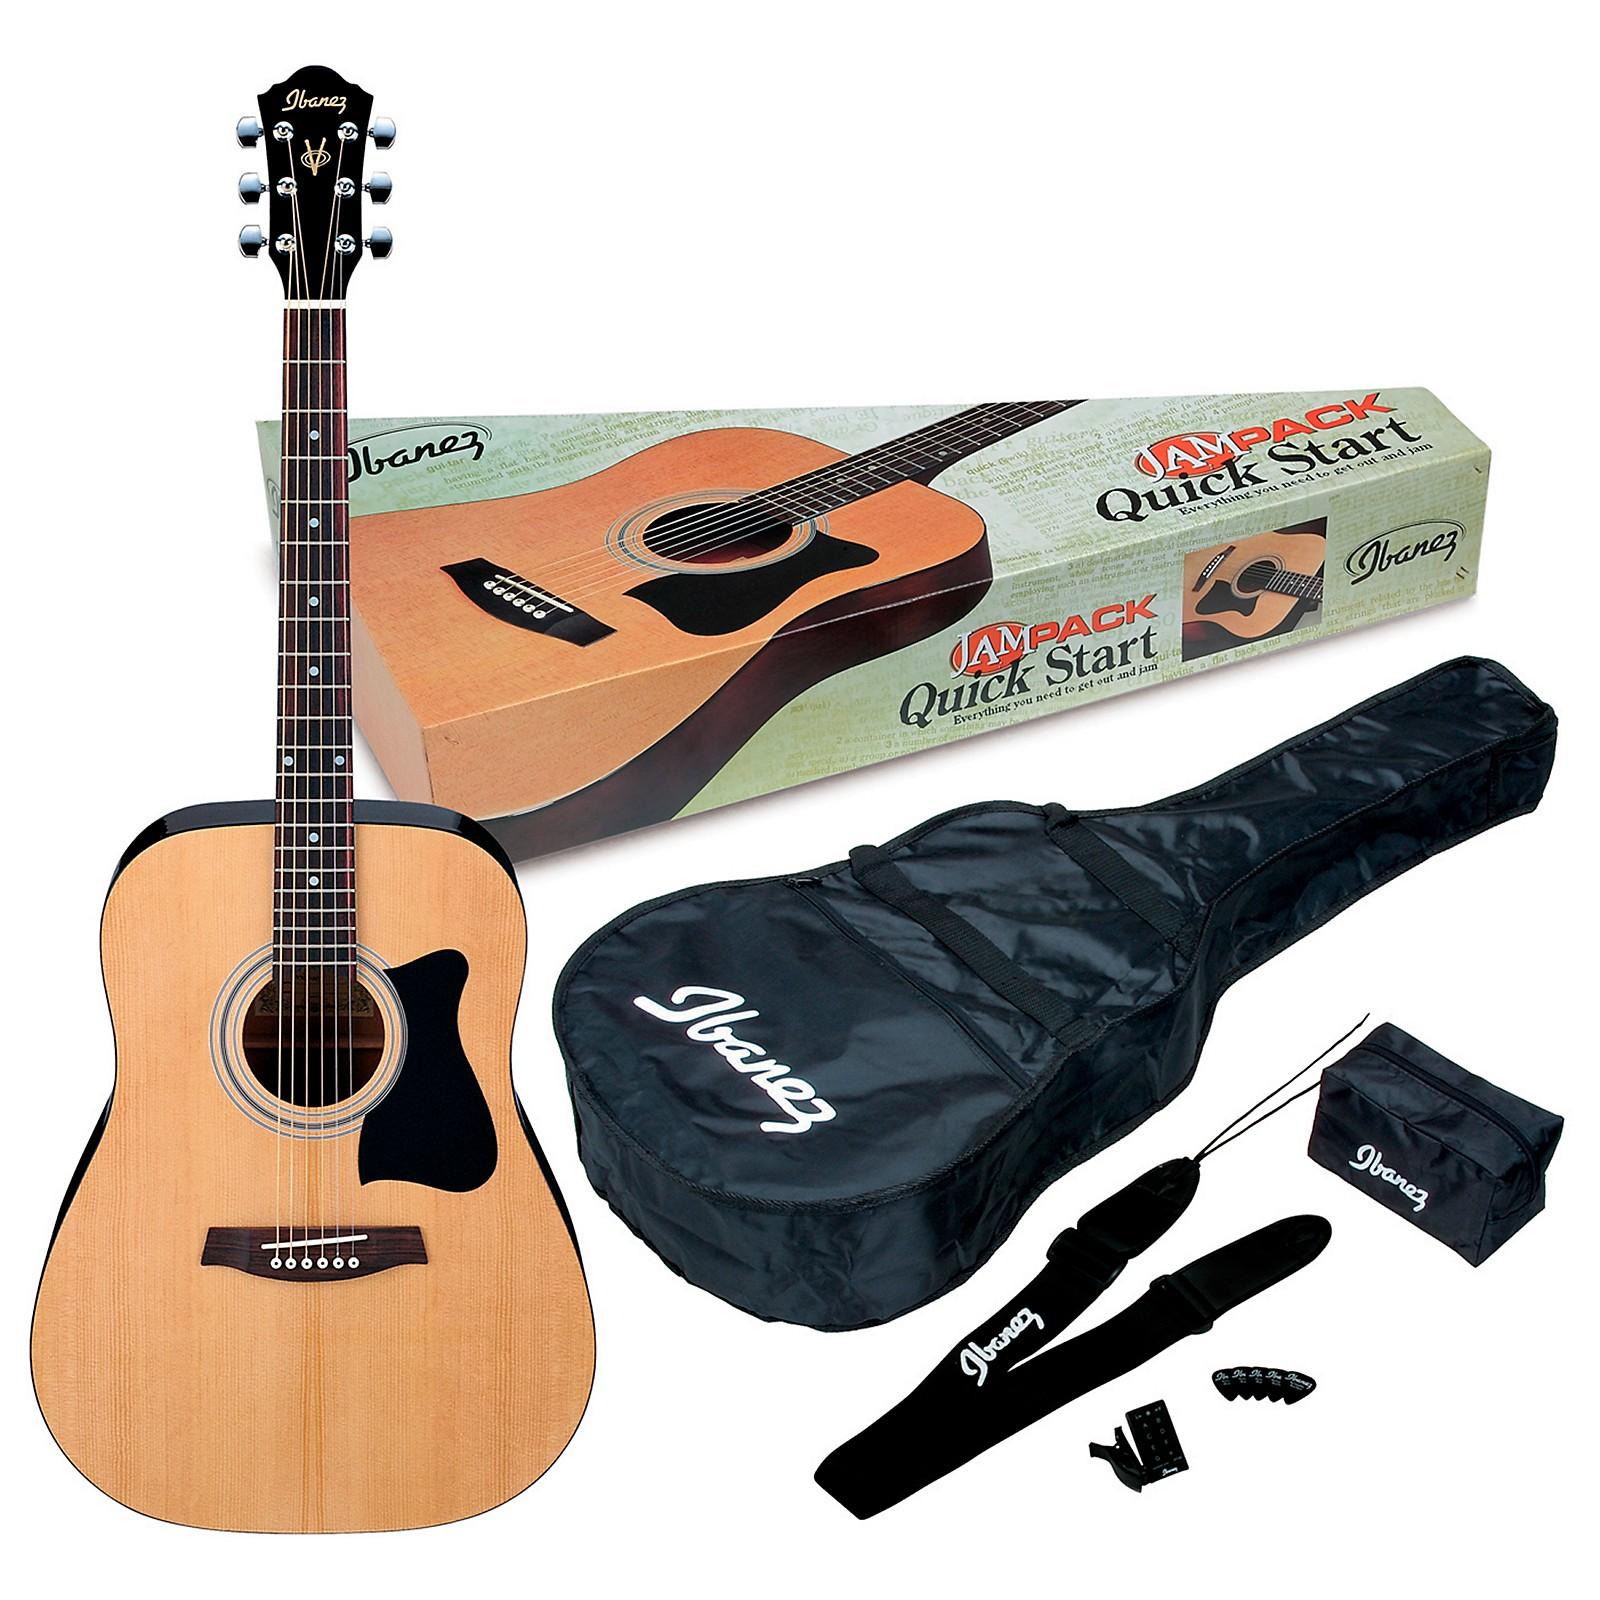 Ibanez JamPack IJV50 Quickstart Dreadnought Acoustic Guitar Pack